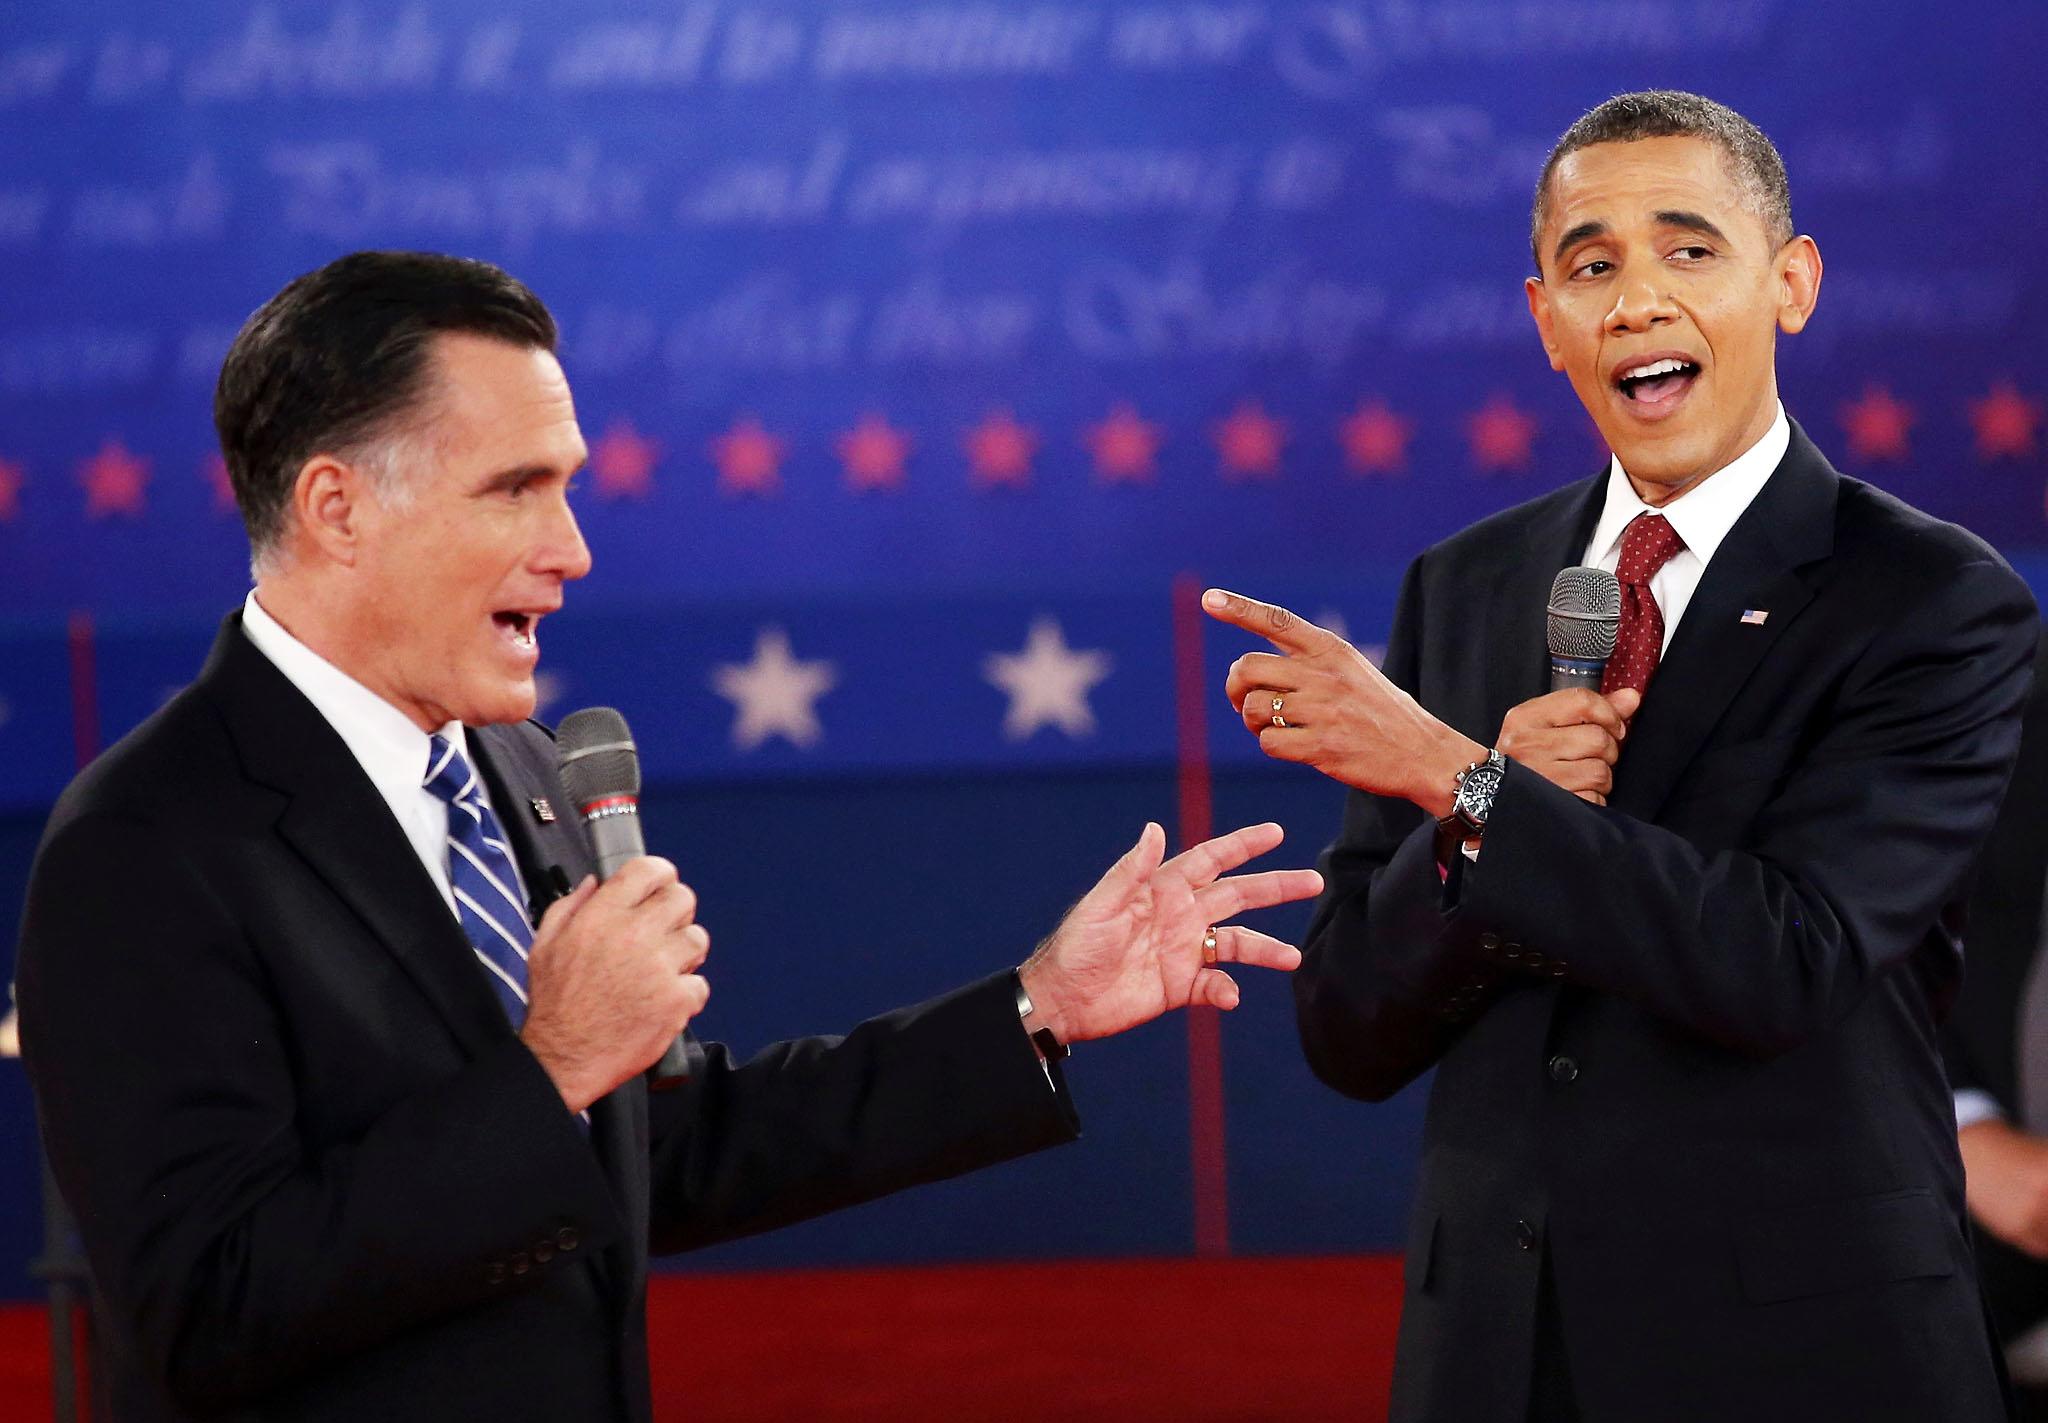 election-all-stars-obama-romney1.jpg